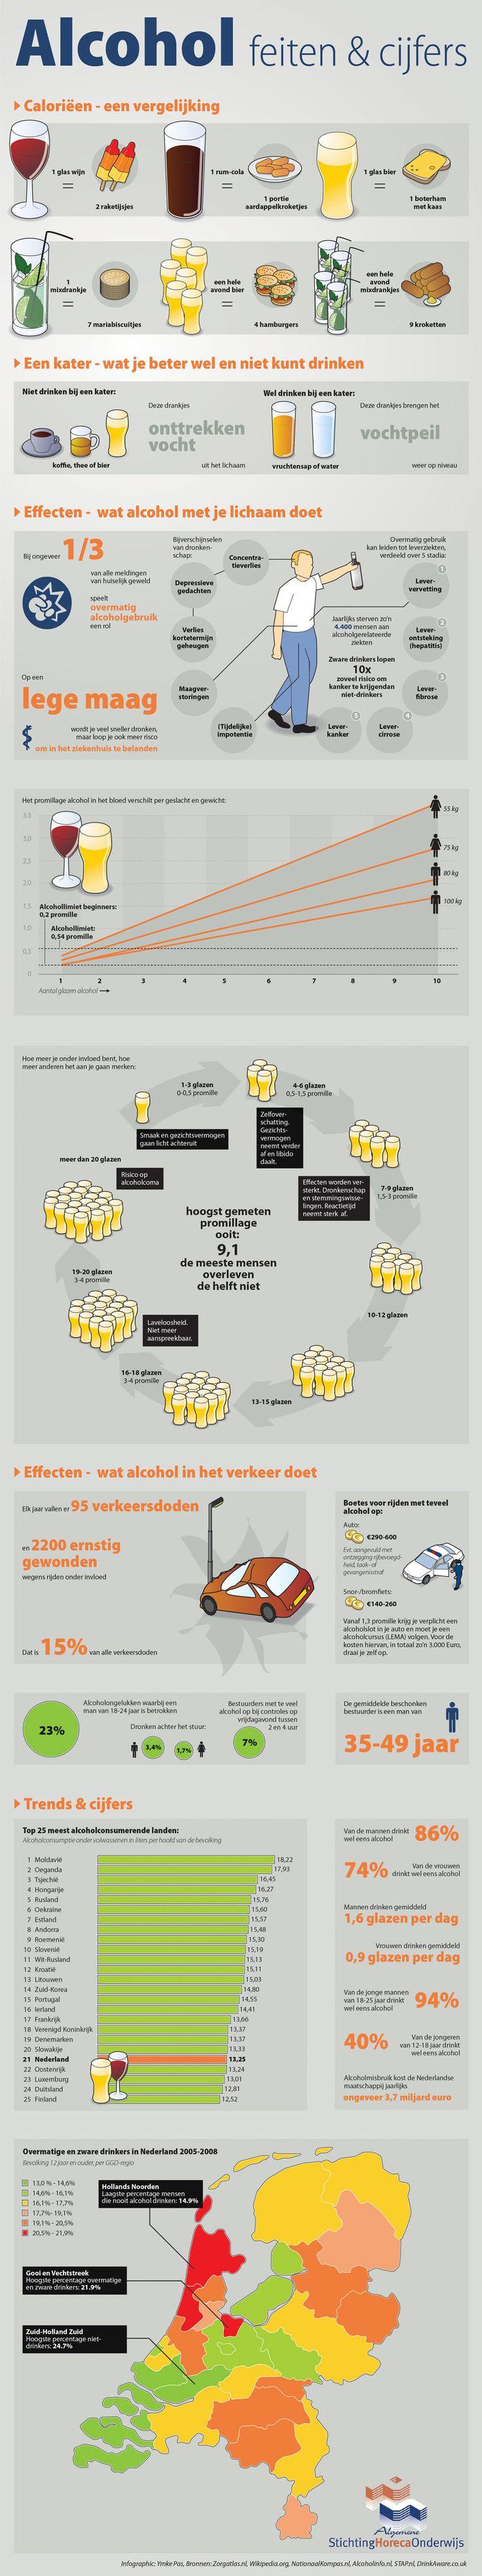 Alcohol feiten (via Algemene Stichting Horeca Onderwijs)